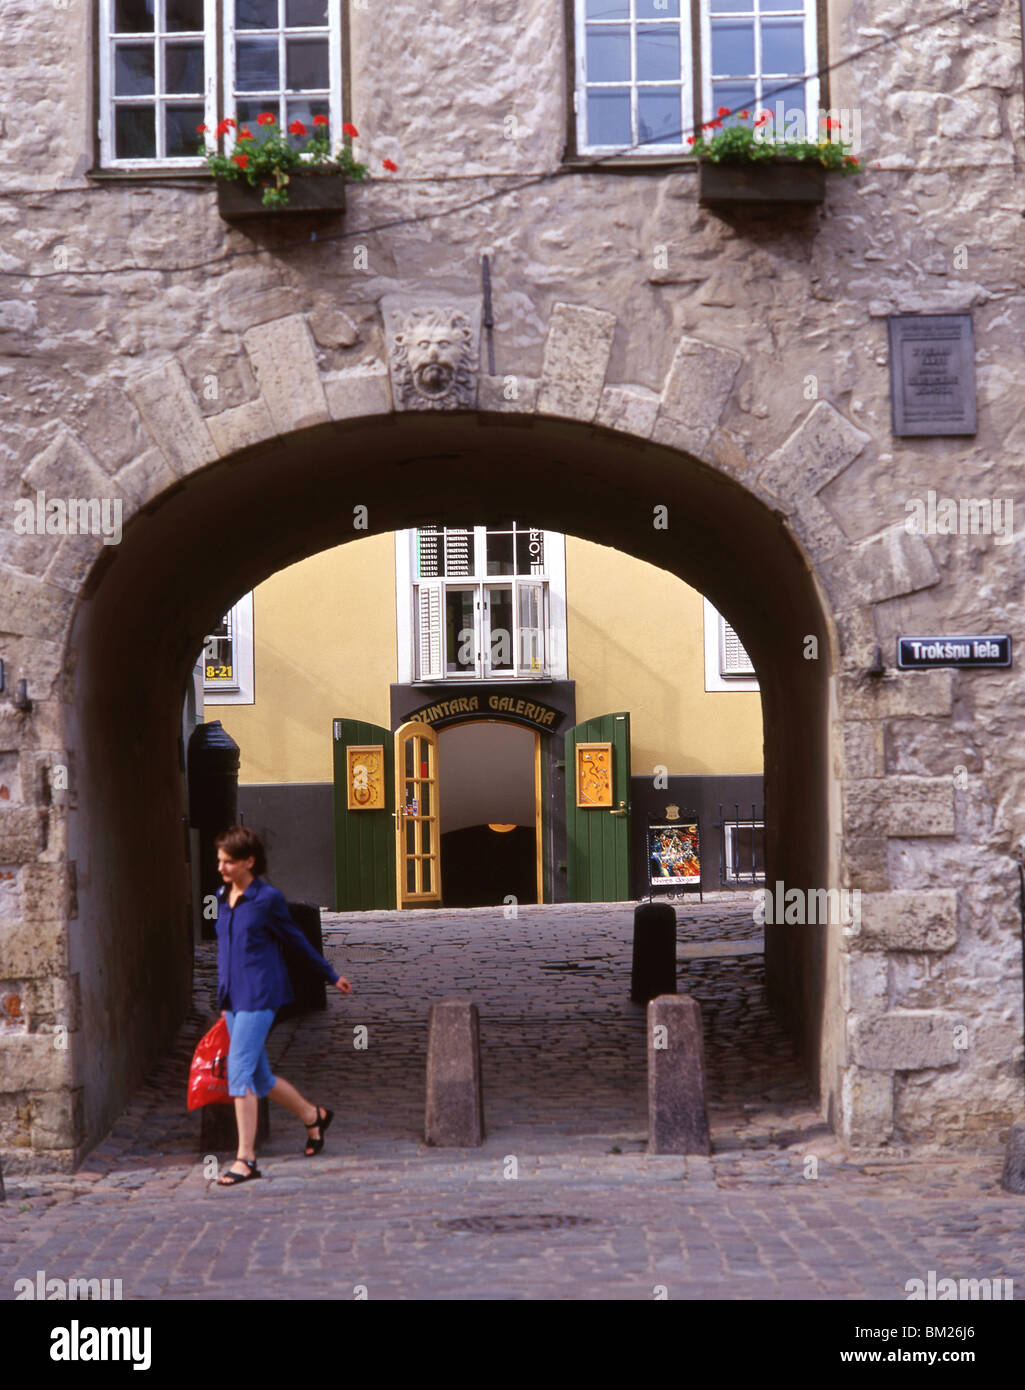 Courtyard, Old Town, Riga, Riga Region, Republic of Latvia - Stock Image